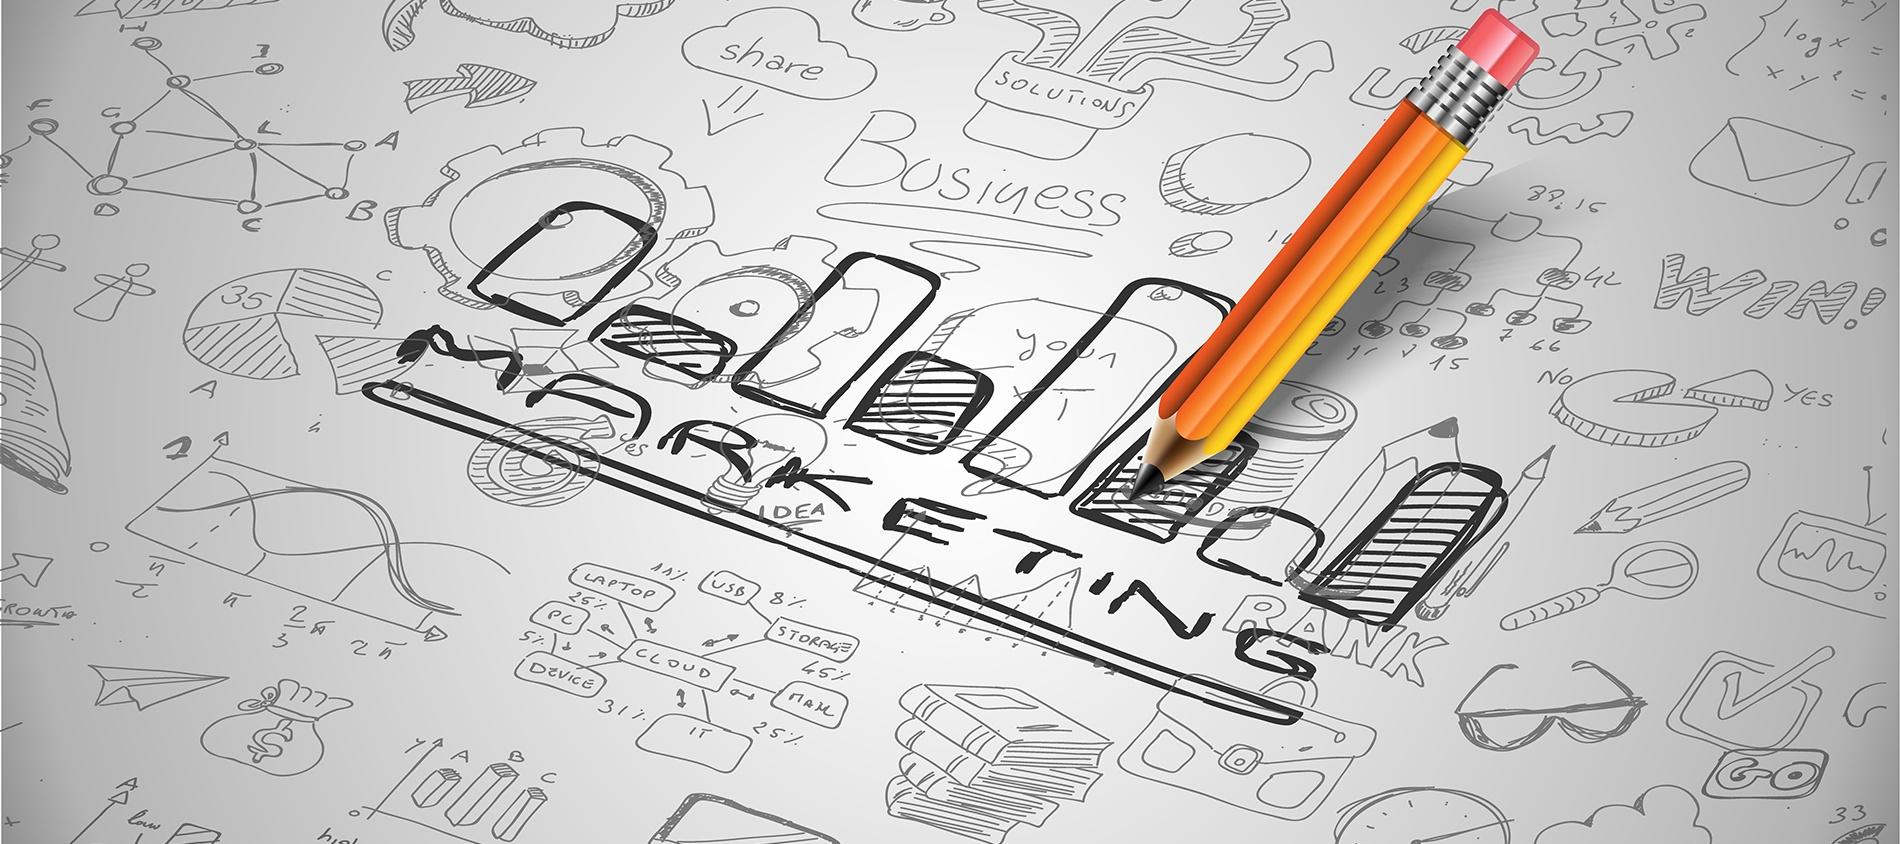 Estrategia creativa de marketing para tu empresa.